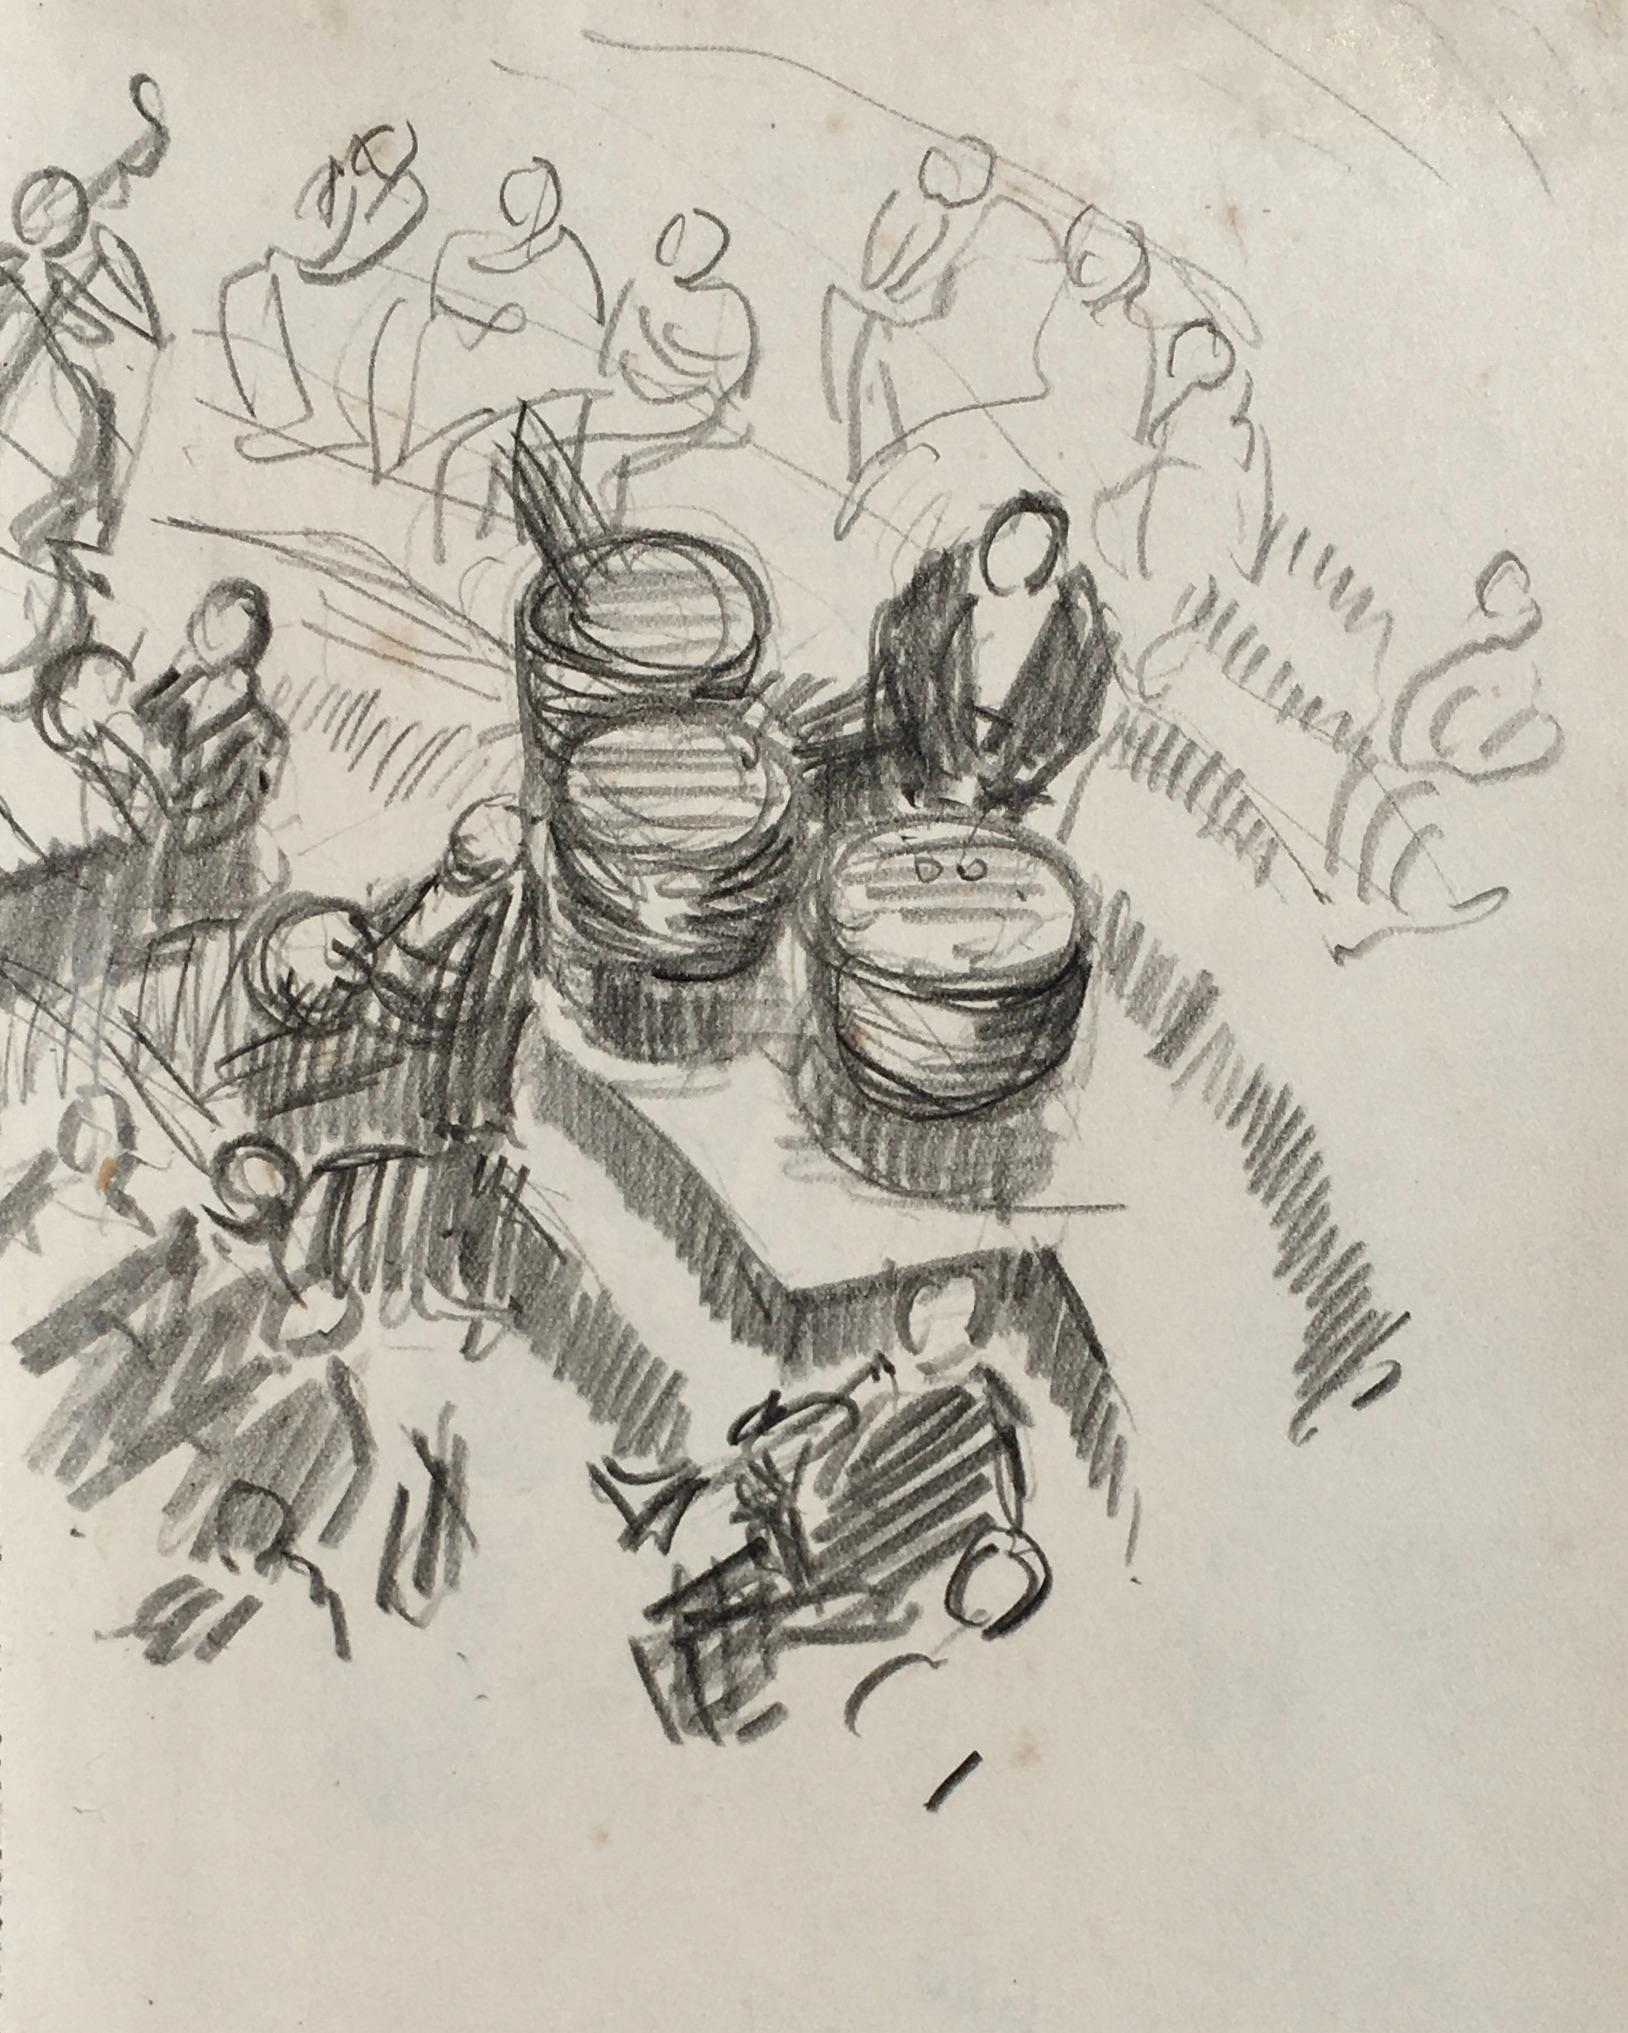 Timpani, London Symphony Orchestra - British drawing by Lord Methuen